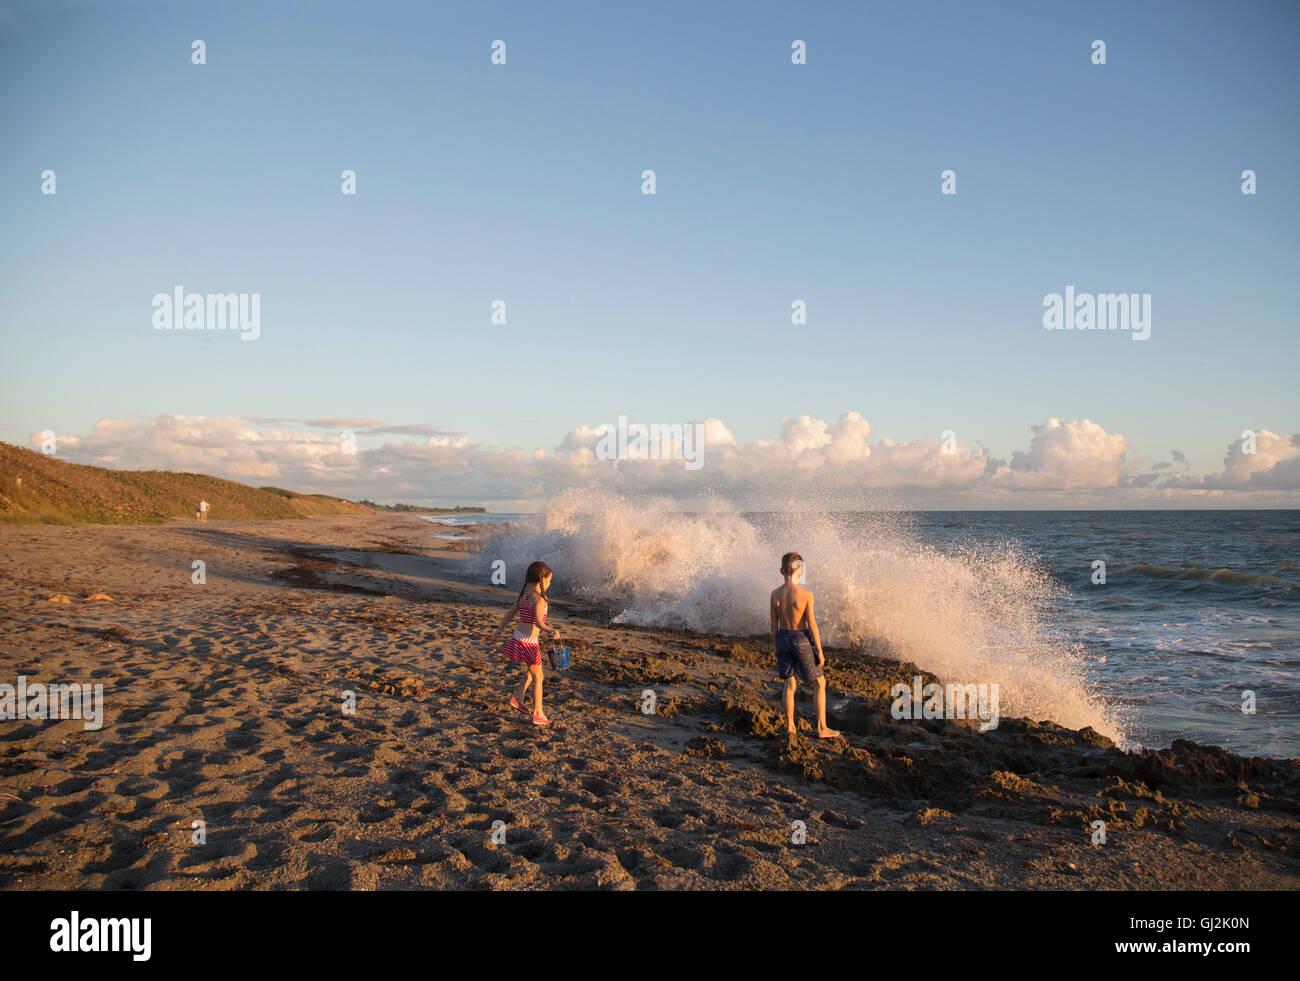 Boy and sister watching splashing waves from beach, Blowing Rocks Preserve, Jupiter Island, Florida, USA Stock Photo